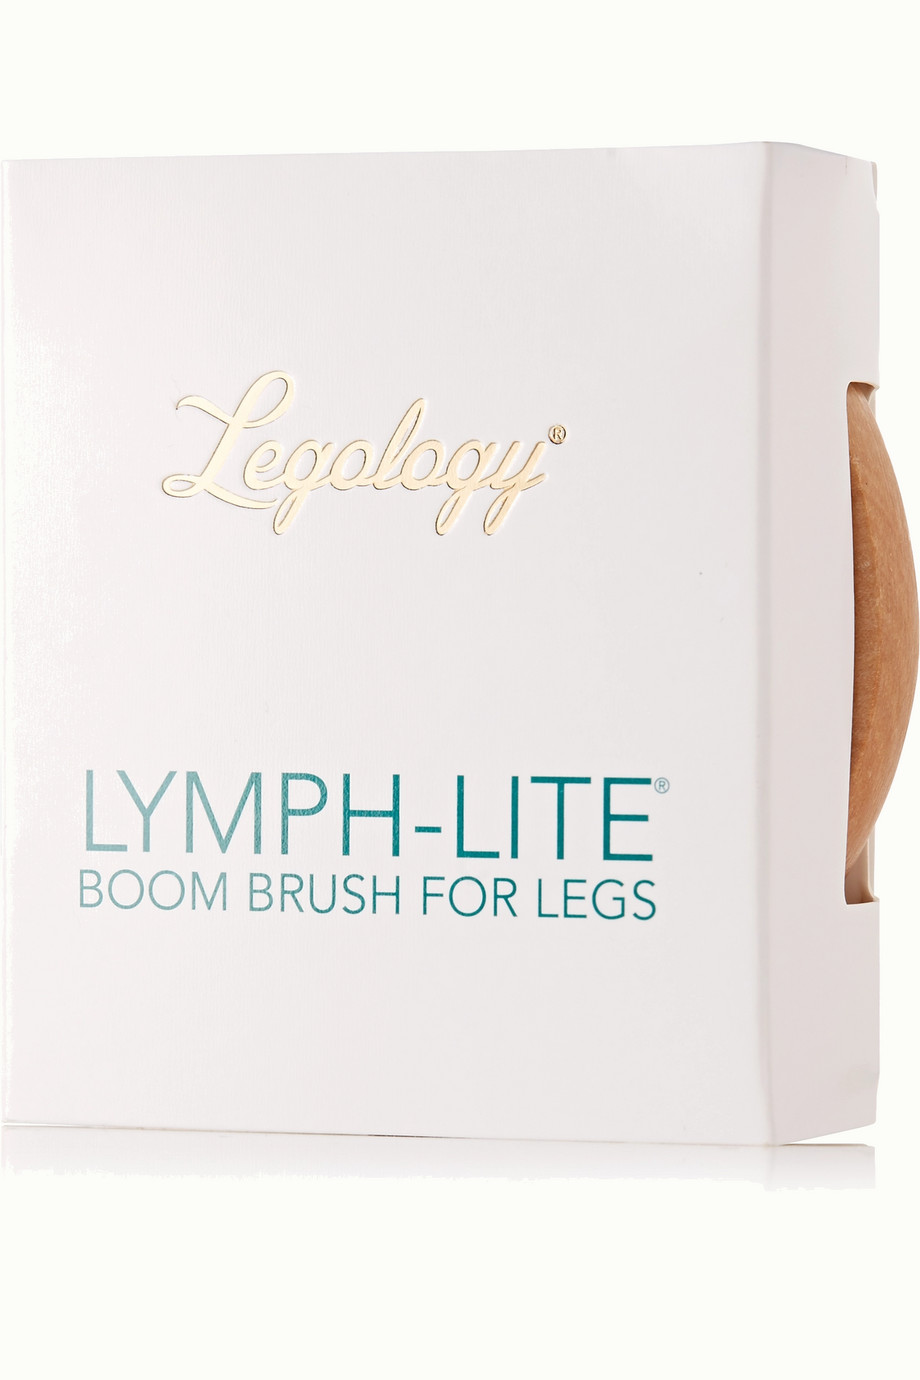 Legology Lymph-Lite Boom Brush For Body